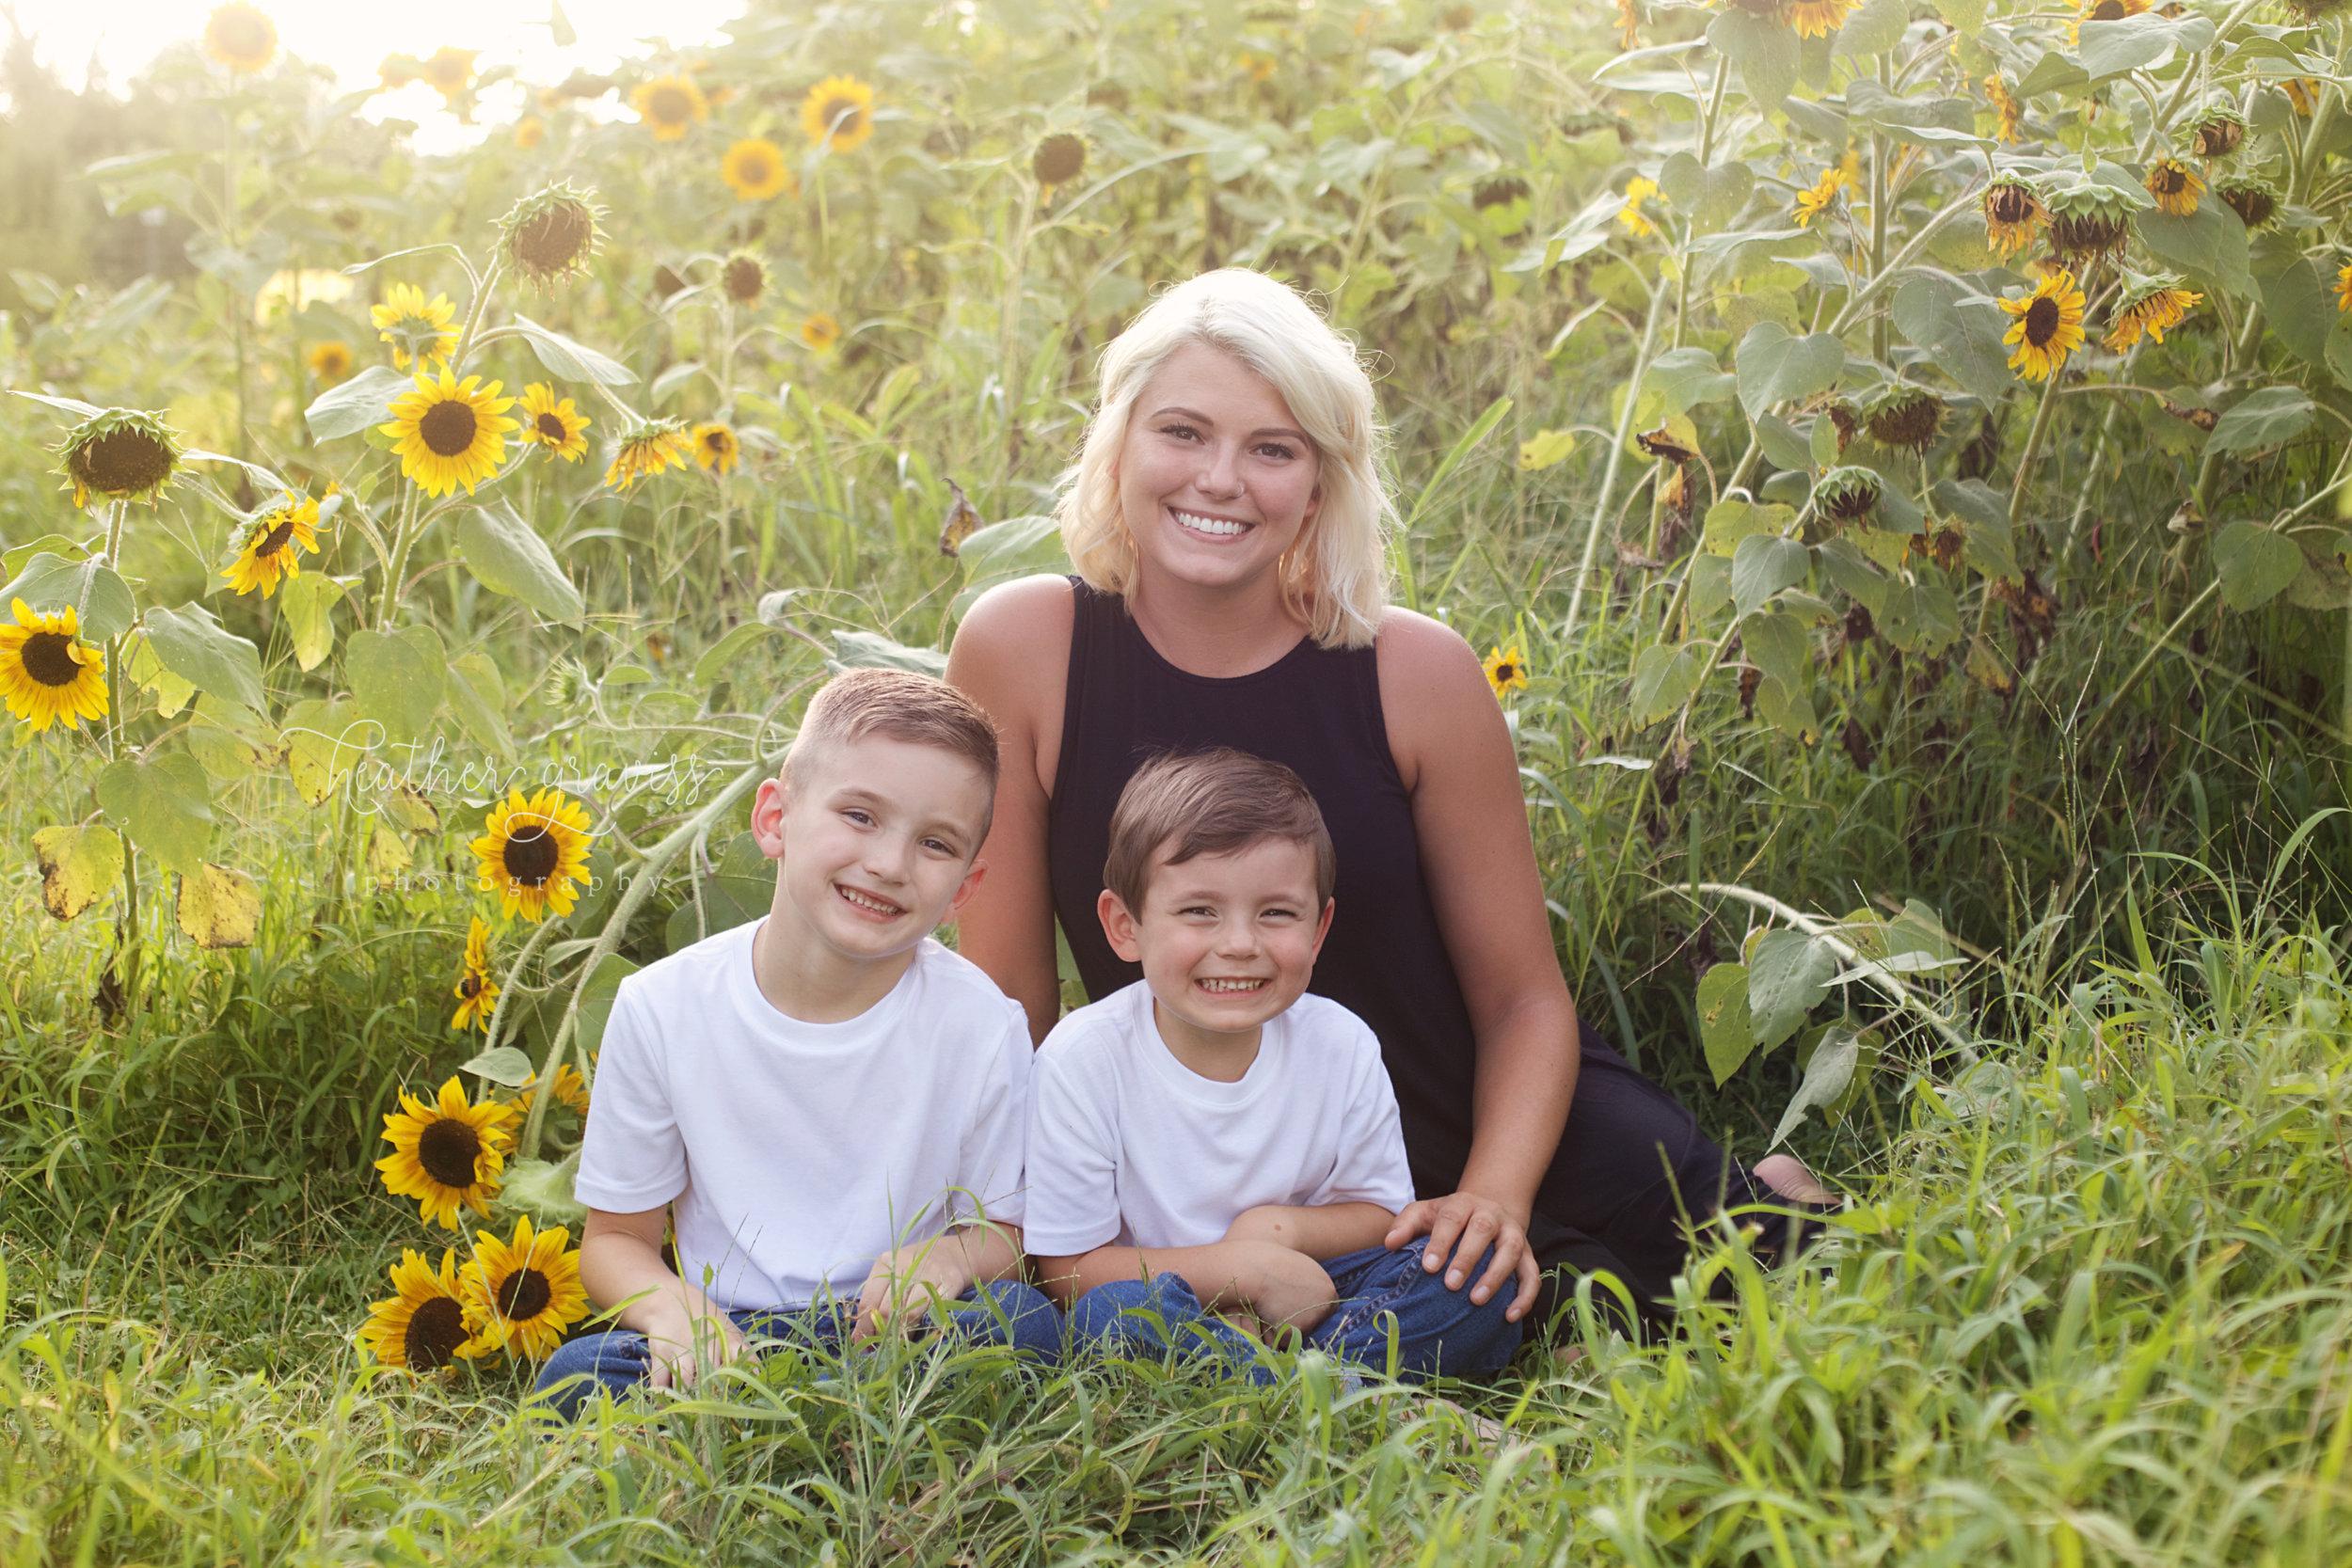 mom-and-suns.jpg